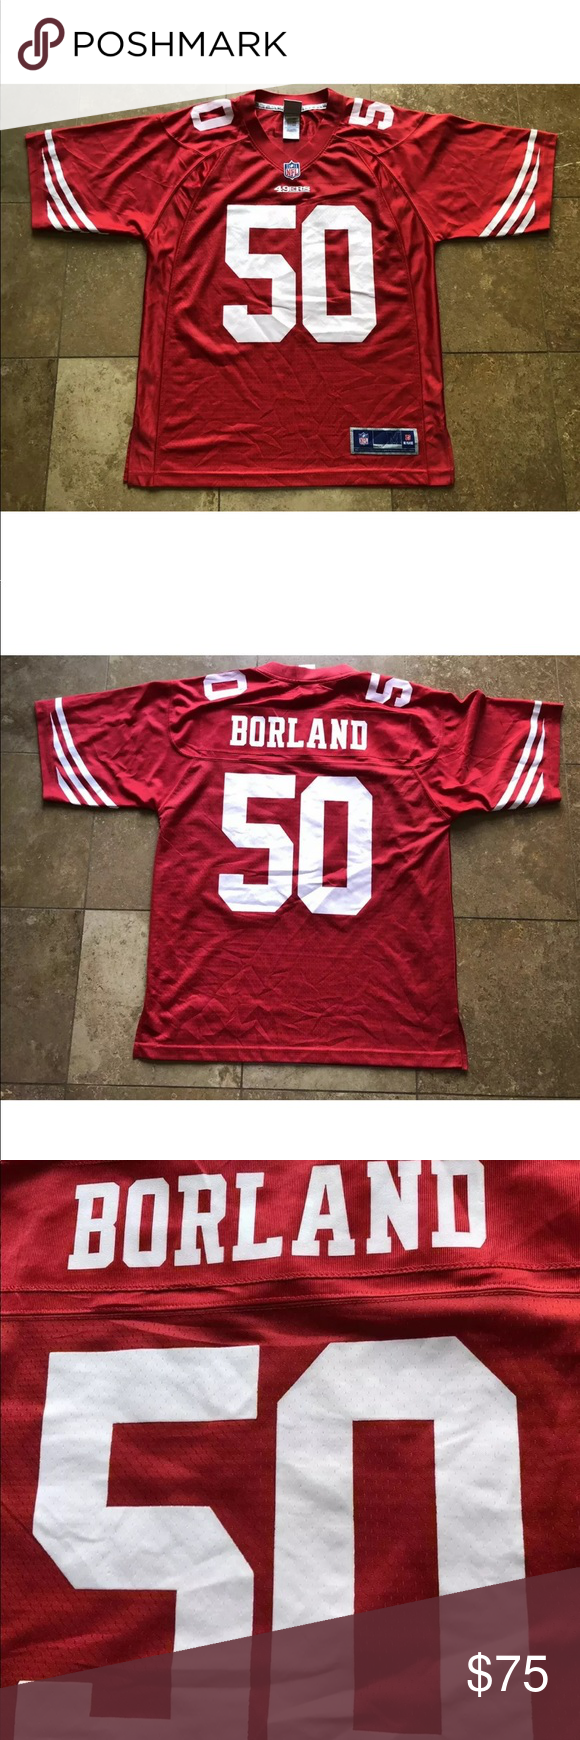 chris borland jersey